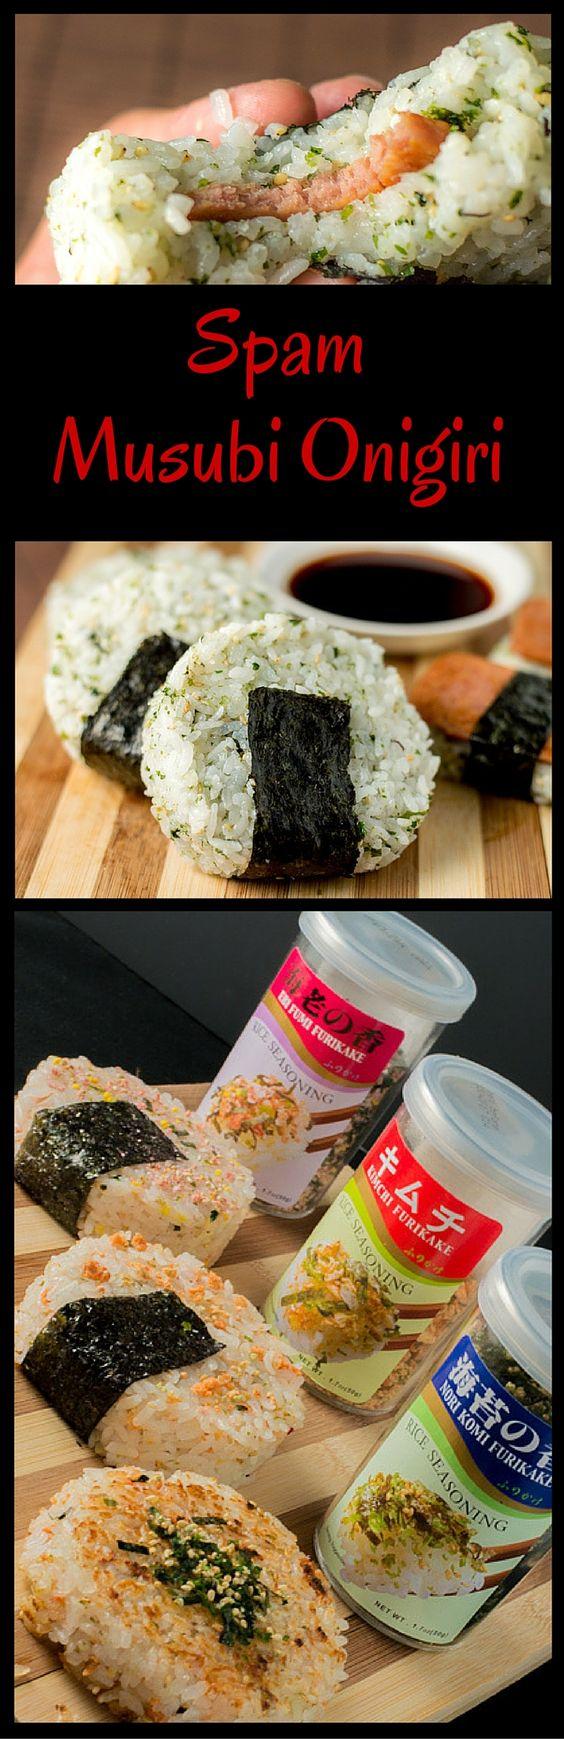 Spam Musubi Onigiri AKA: Poor man's sushi